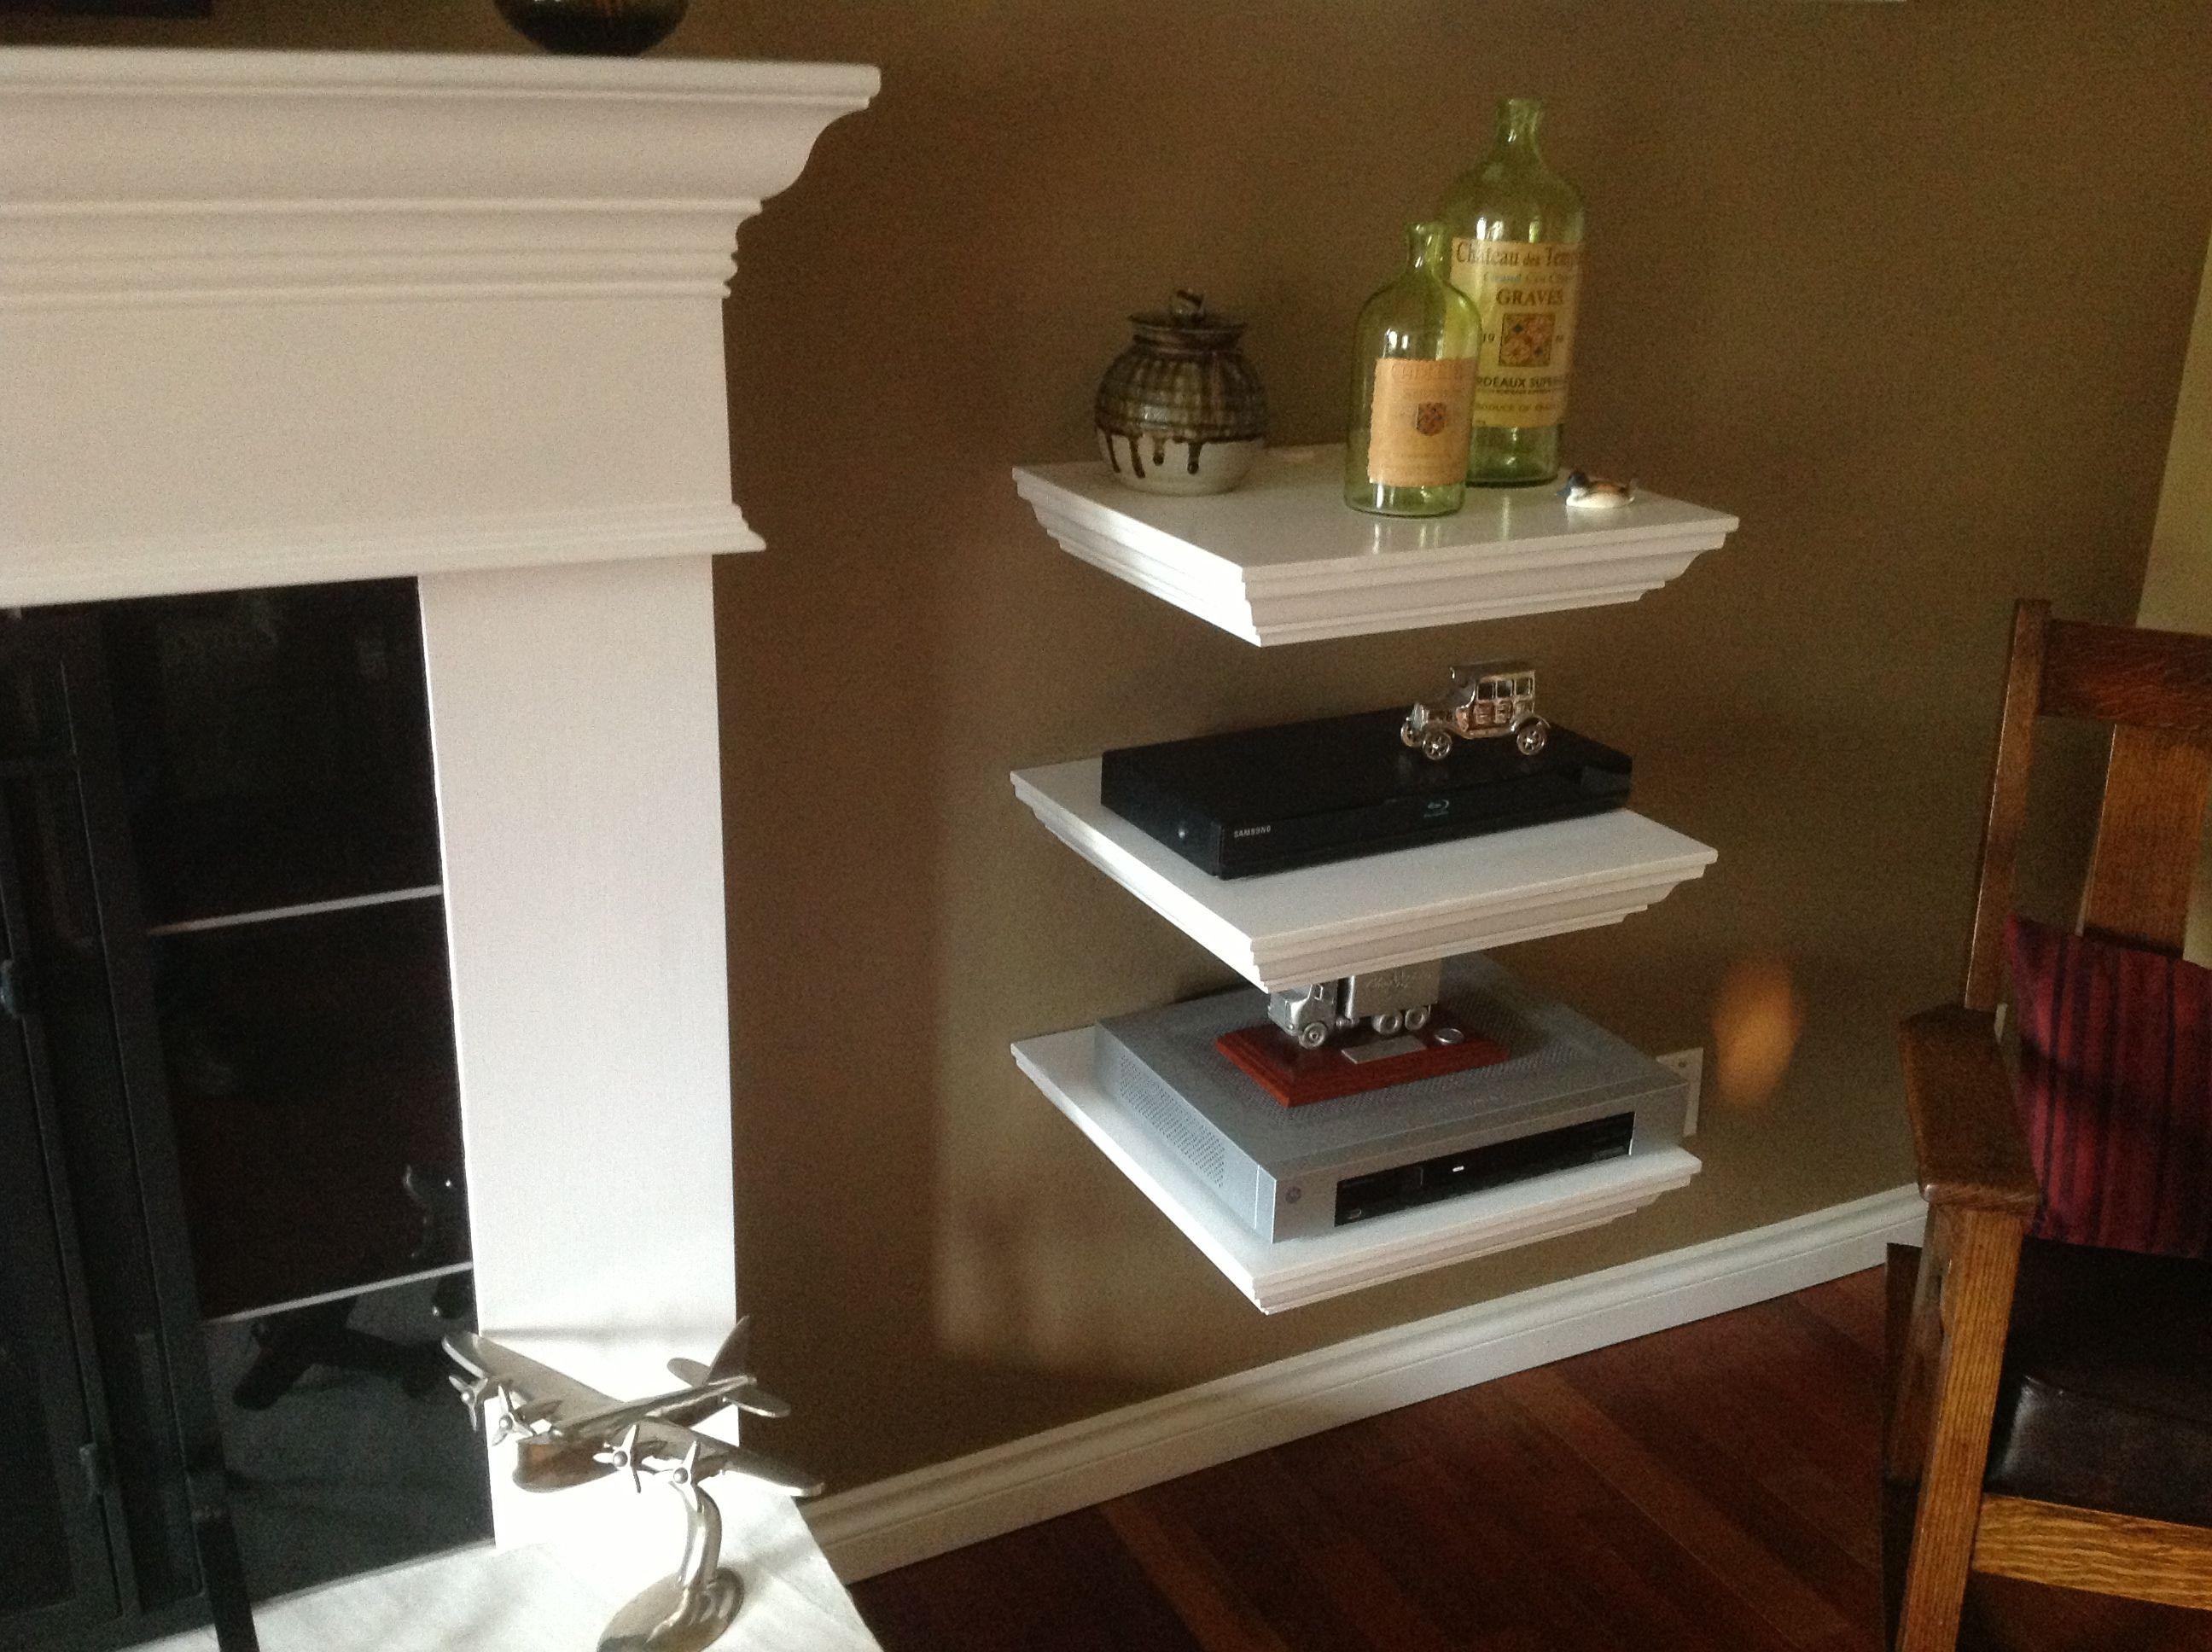 Home Entertainment Shelf System I Built All Cables Go Down Into The Hollow Shelf Out The Back Into Tv Above Fireplace Entertainment Shelves Fireplace Shelves